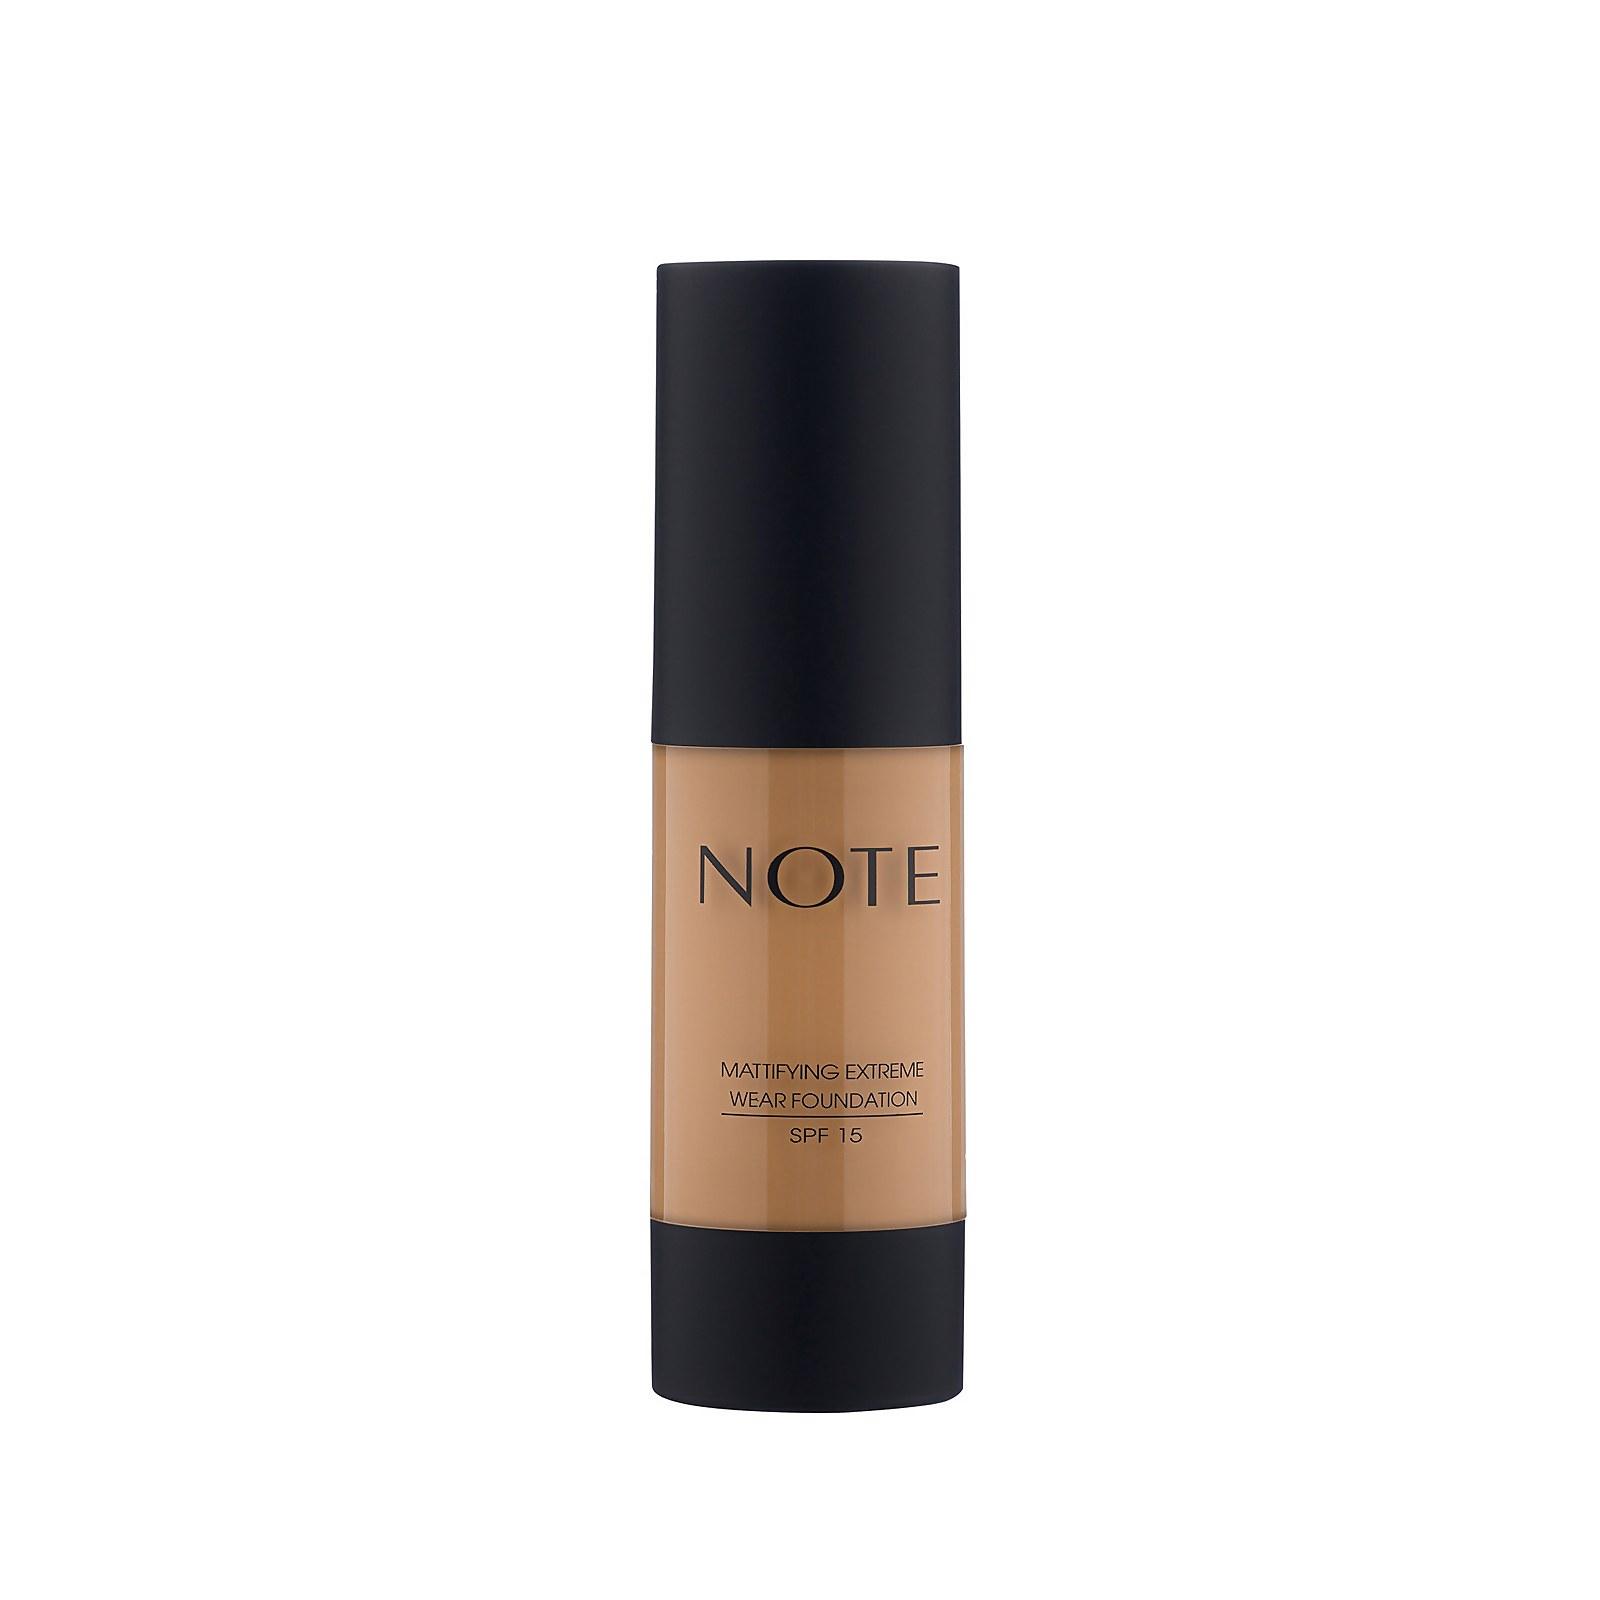 Купить Note Cosmetics Mattifying Extreme Wear Foundation 35ml (Various Shades) - 102 Warm Almond